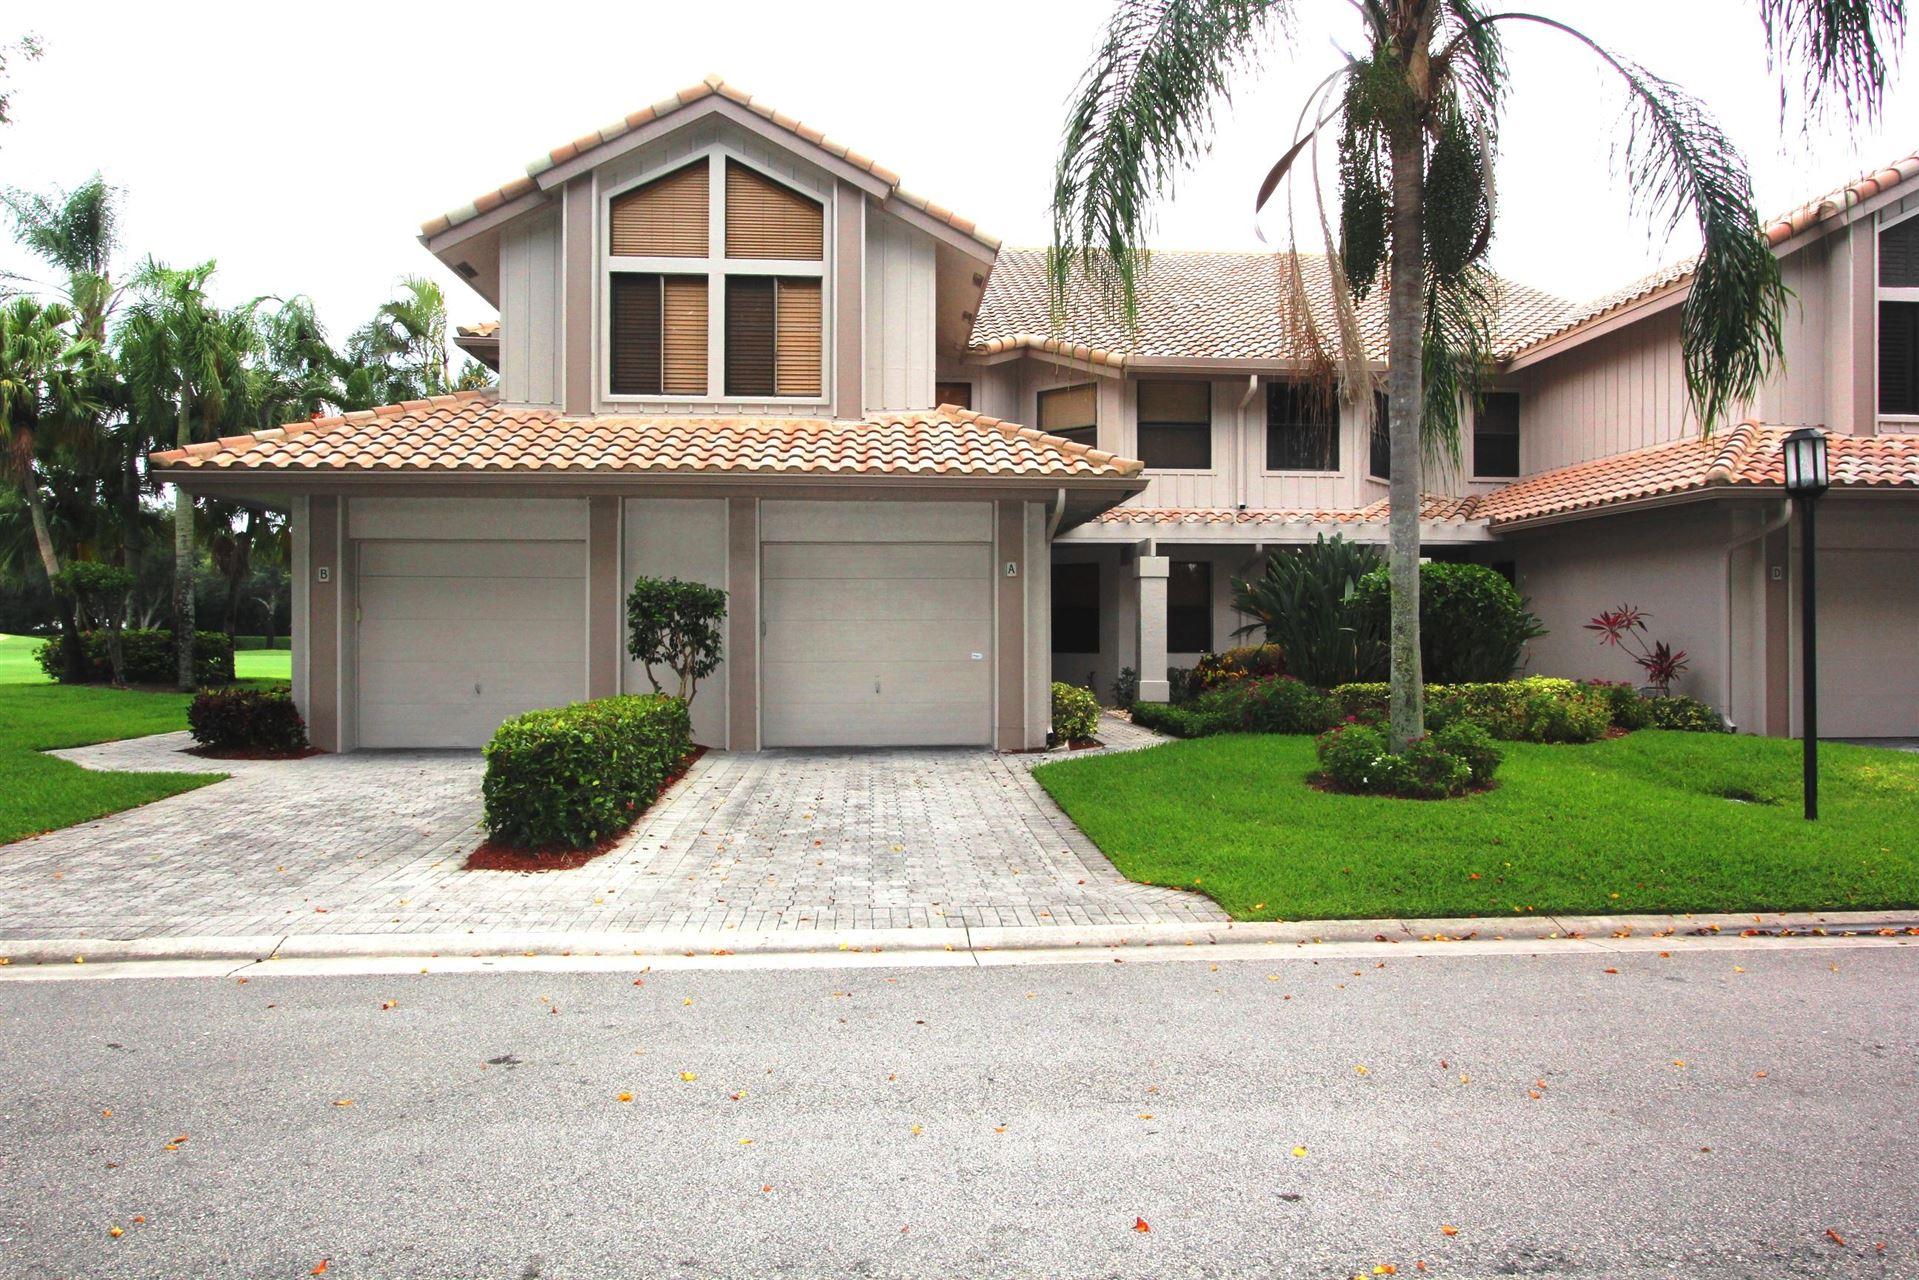 16856 Isle Of Palms Drive #A, Delray Beach, FL 33484 - #: RX-10485766